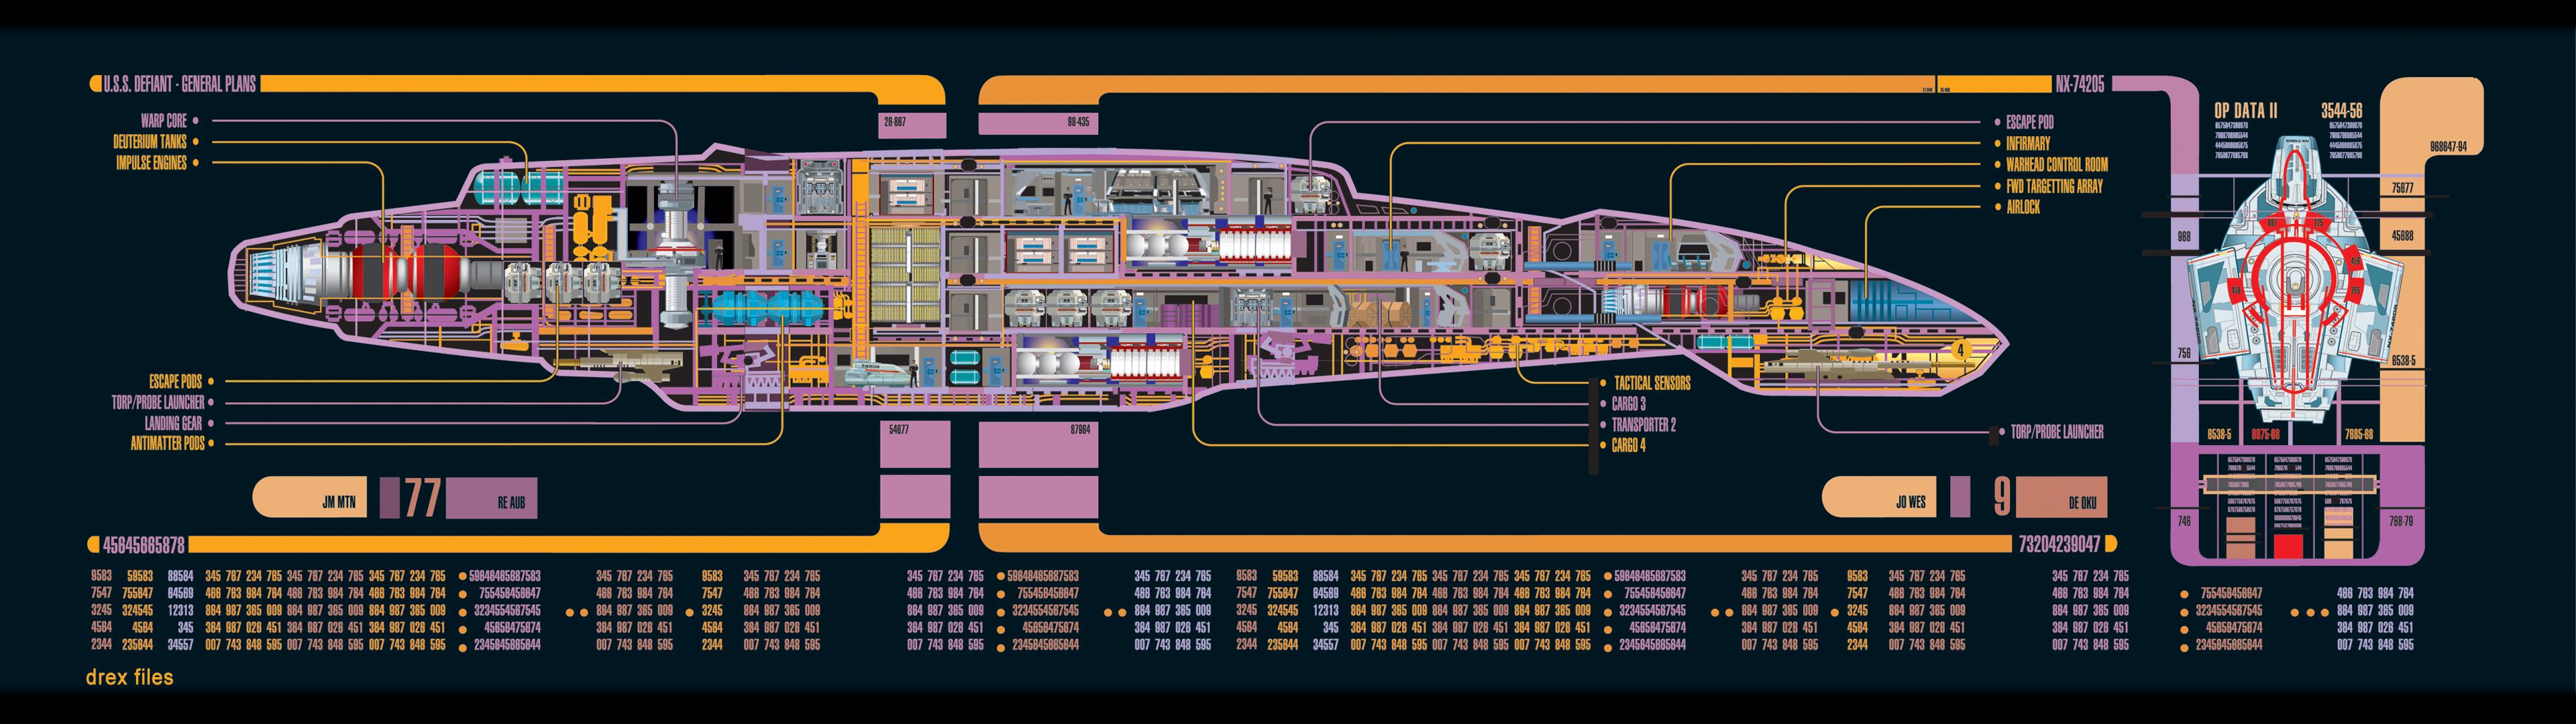 Star Trek Computer Wallpapers Desktop Backgrounds Dual Monitor